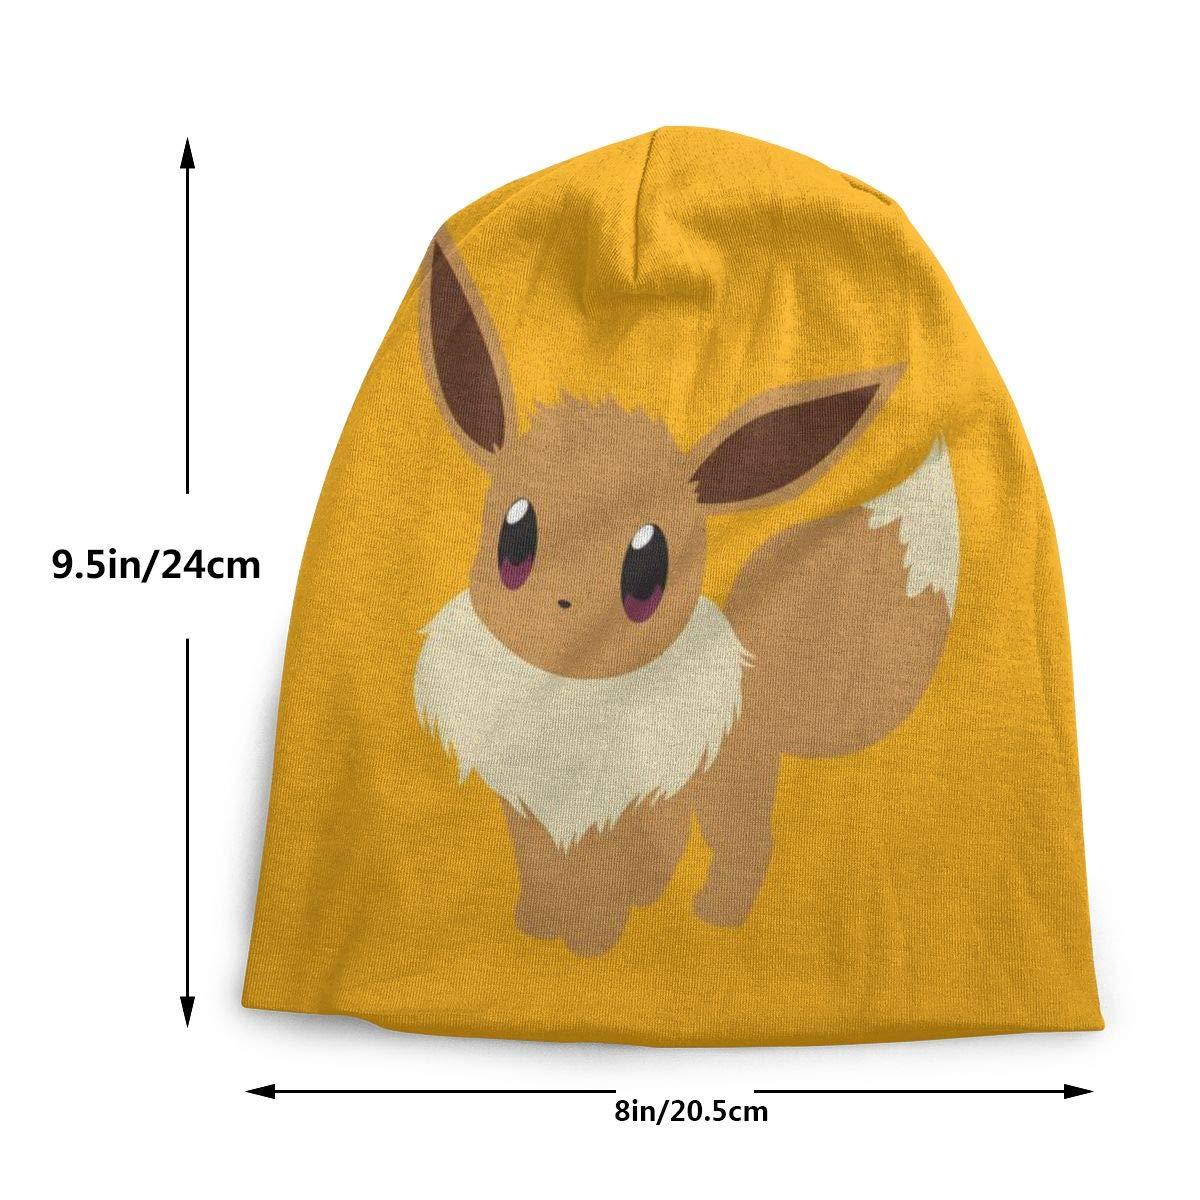 Amstores Novelty Pok/émon Pikachu Girls Boys Beanie Winter Knit Hat